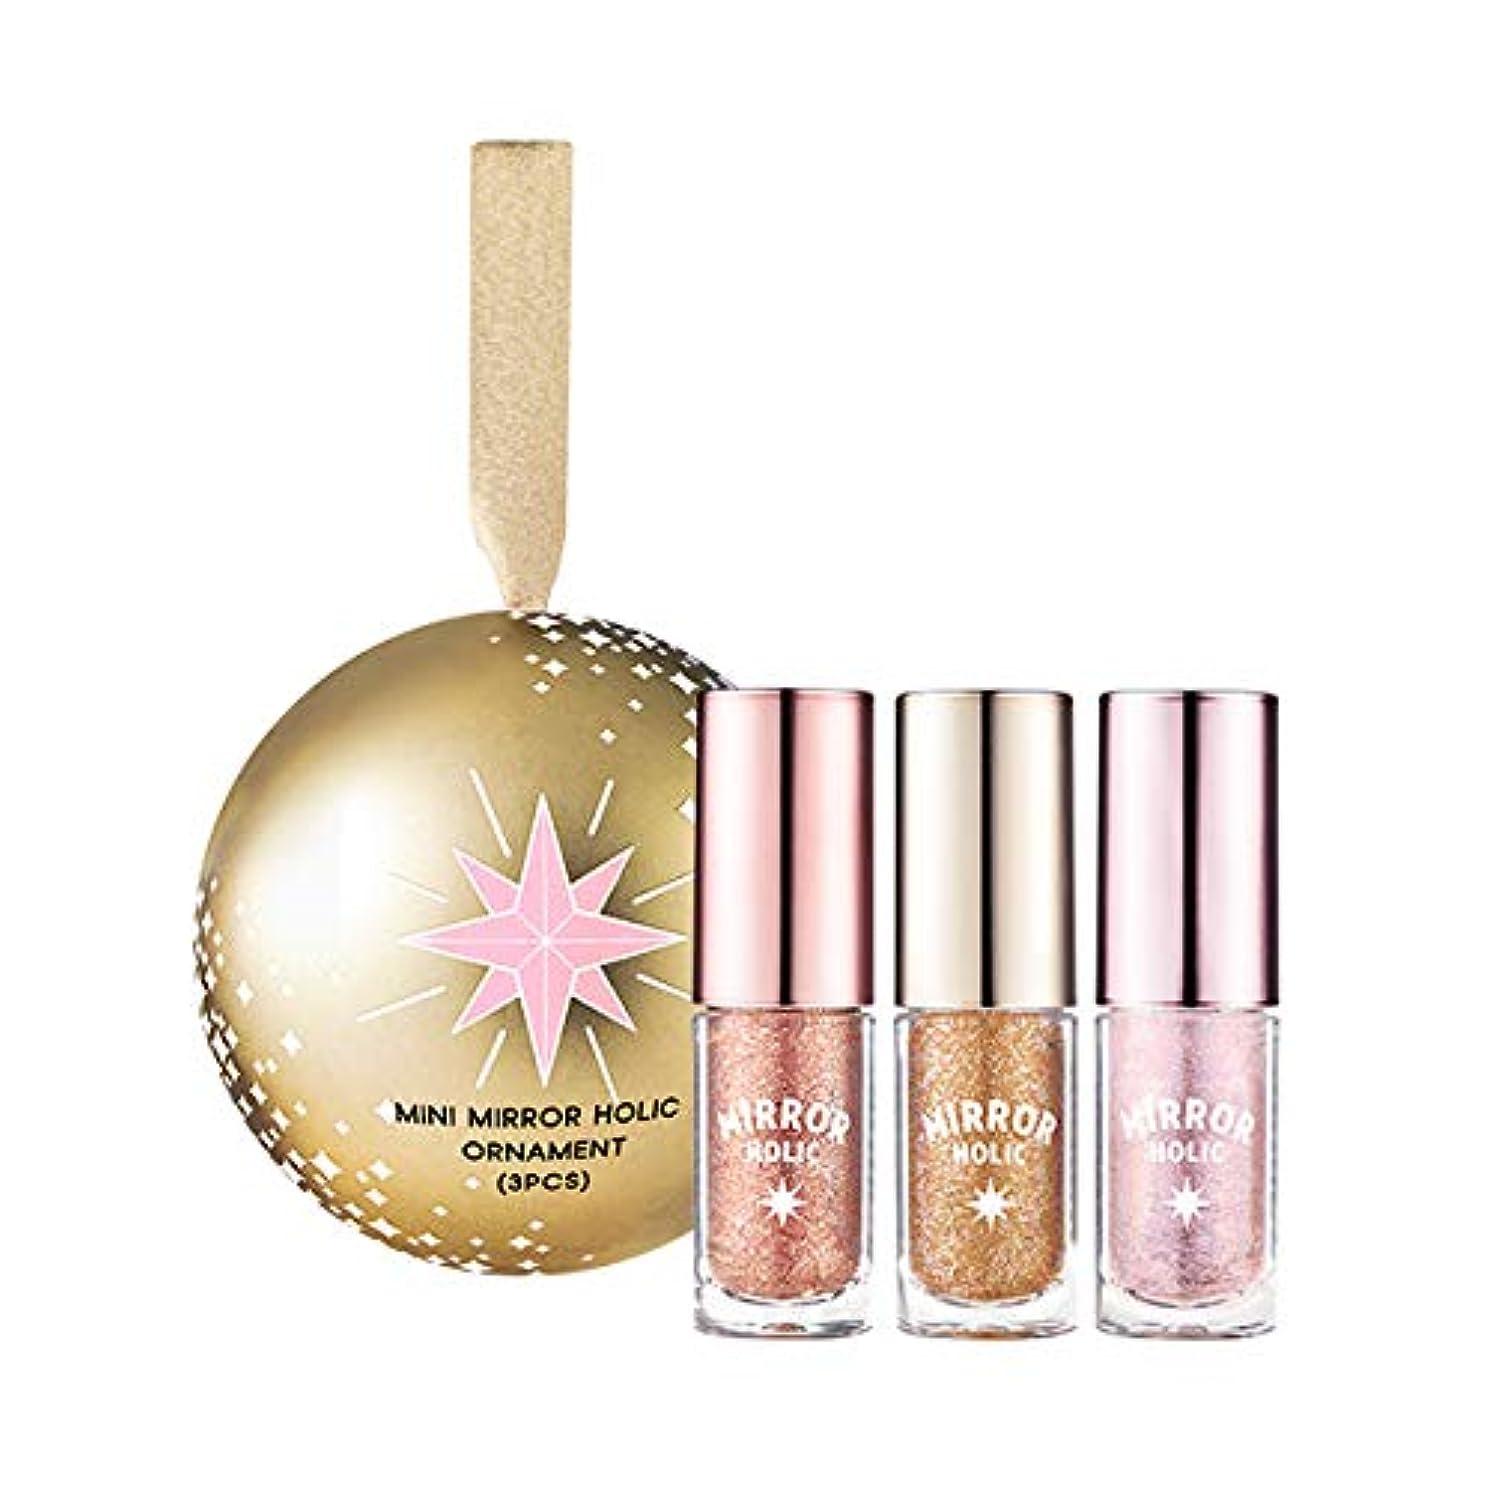 ETUDE HOUSE 【Holiday】 Tiny Twinkle Mini Mirror Holic Liquid Eyes Ornament (3PCS) / エチュードハウス タイニー タイニートゥインクル ミラーホリックオーナメント